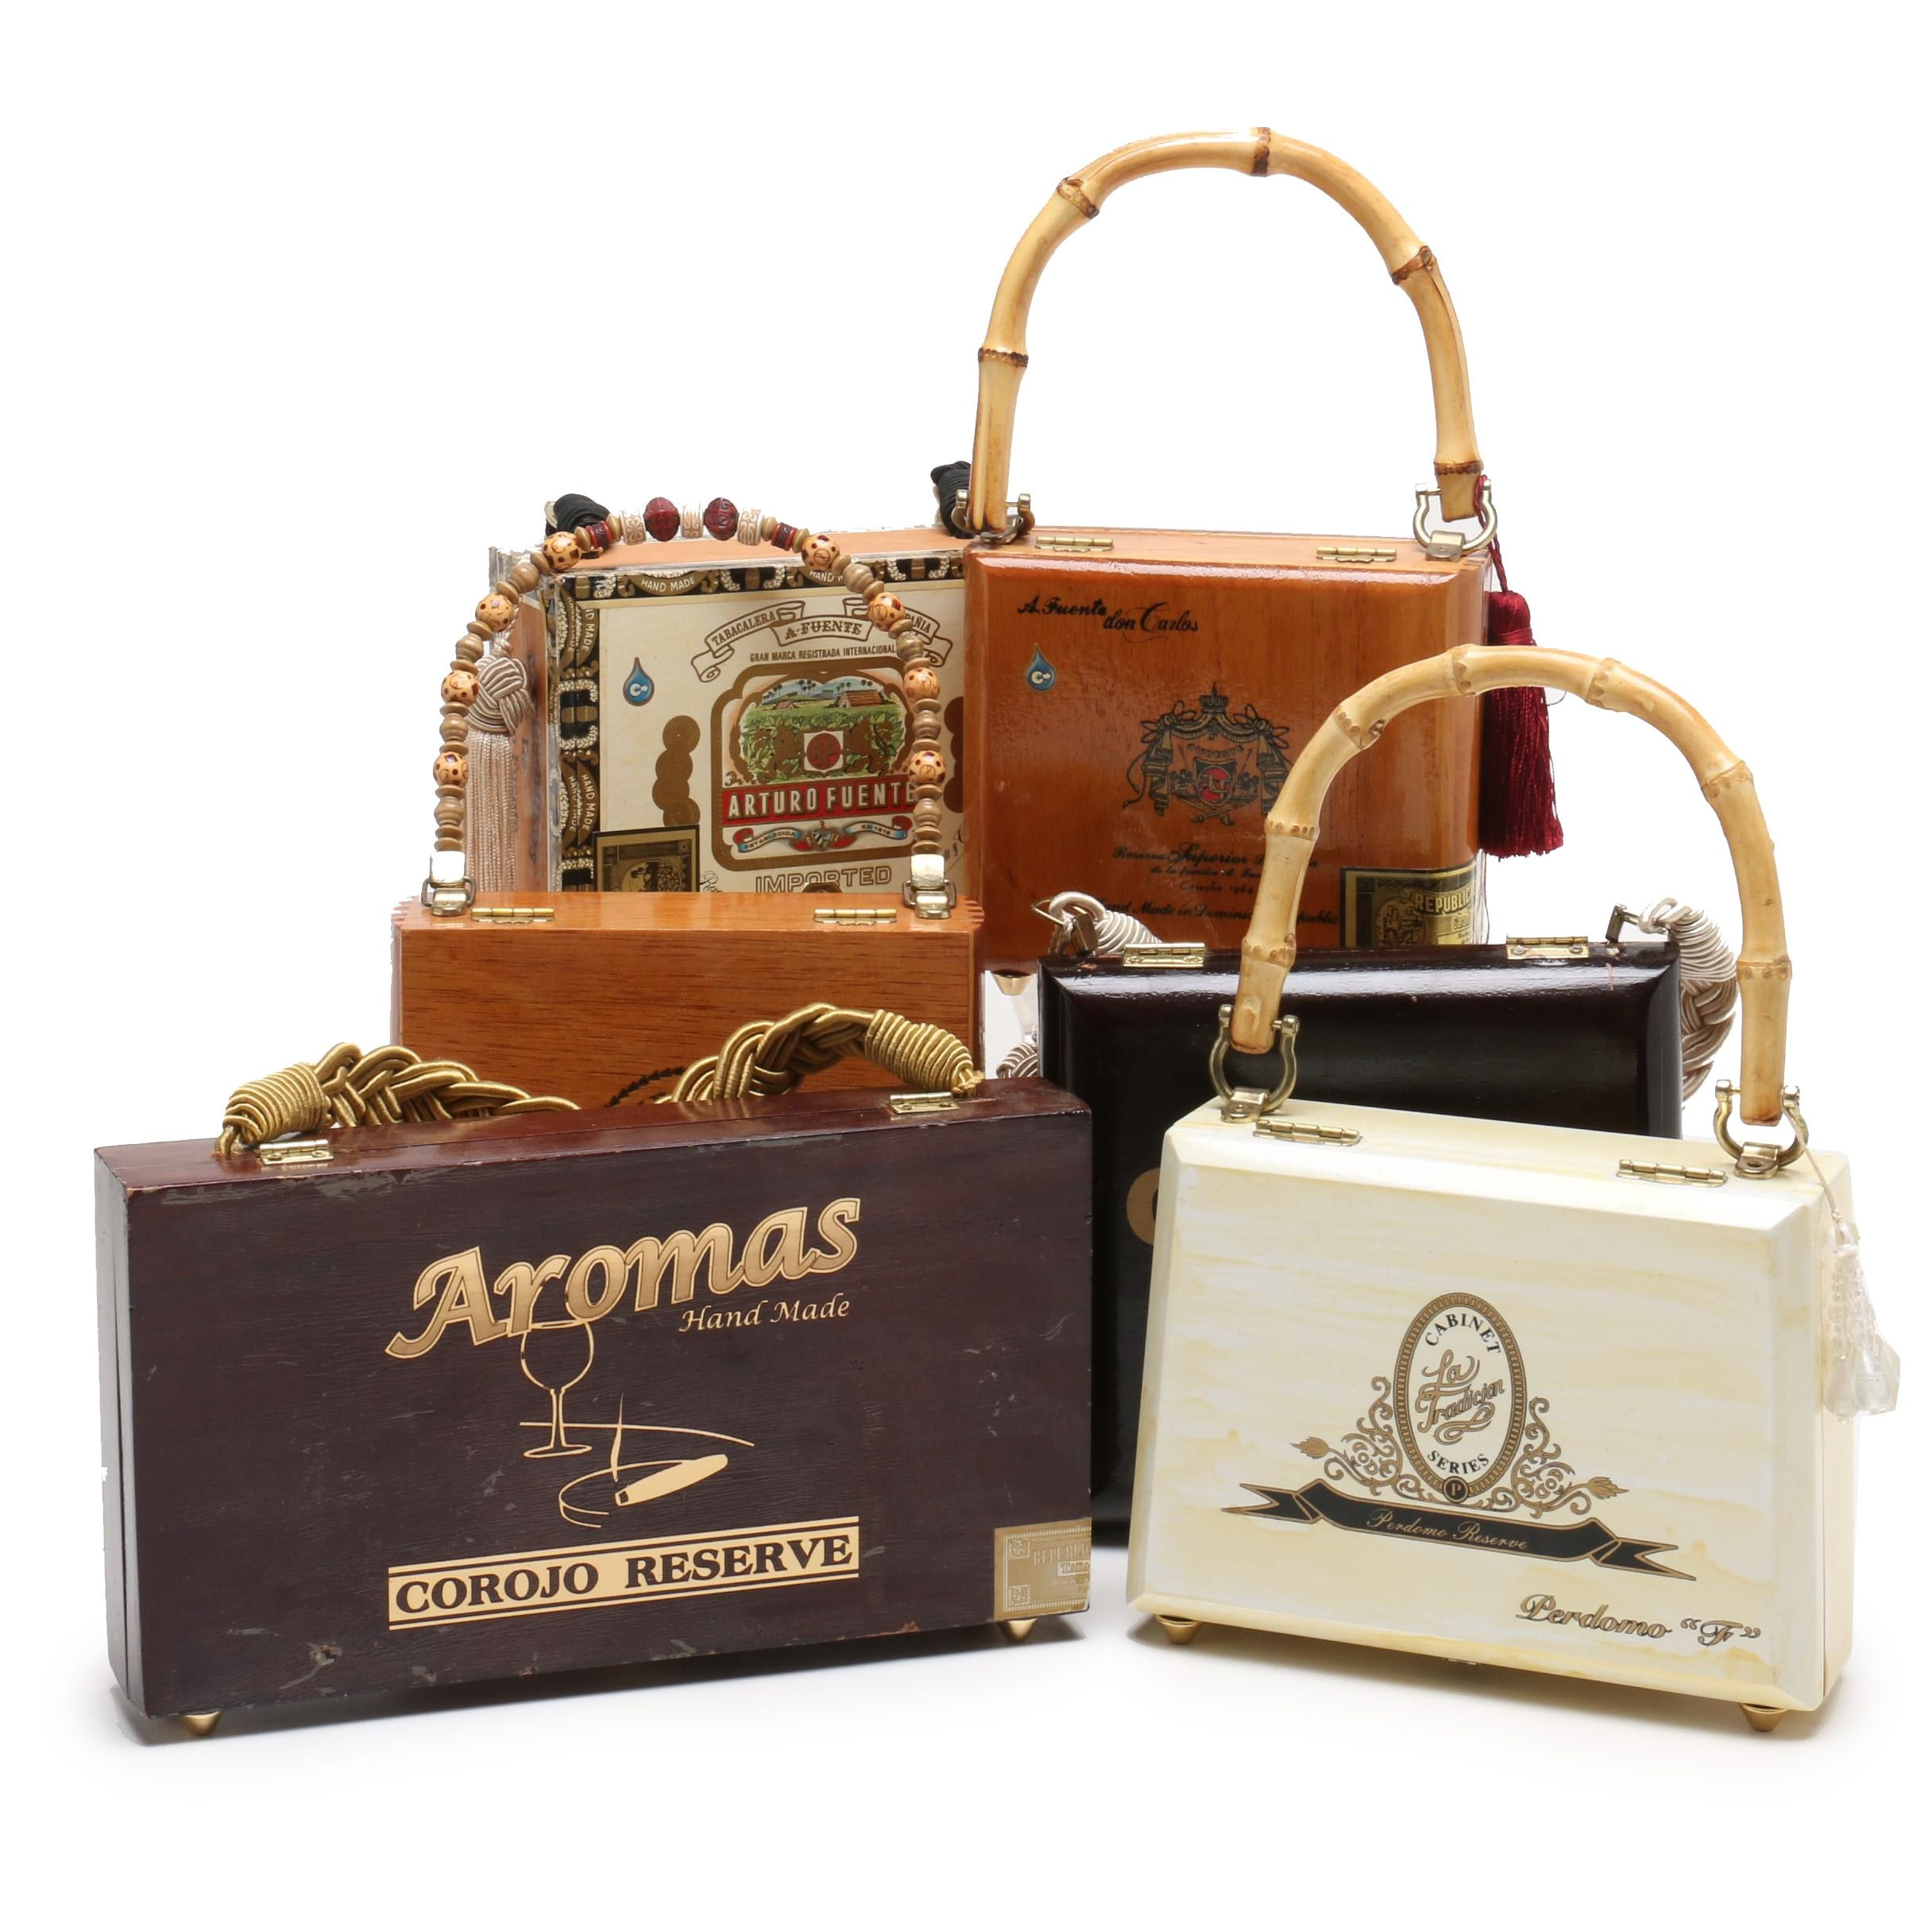 Arturo Fuente Cigar Box Purses and Other Cigar Box Purses, Late 20th Century